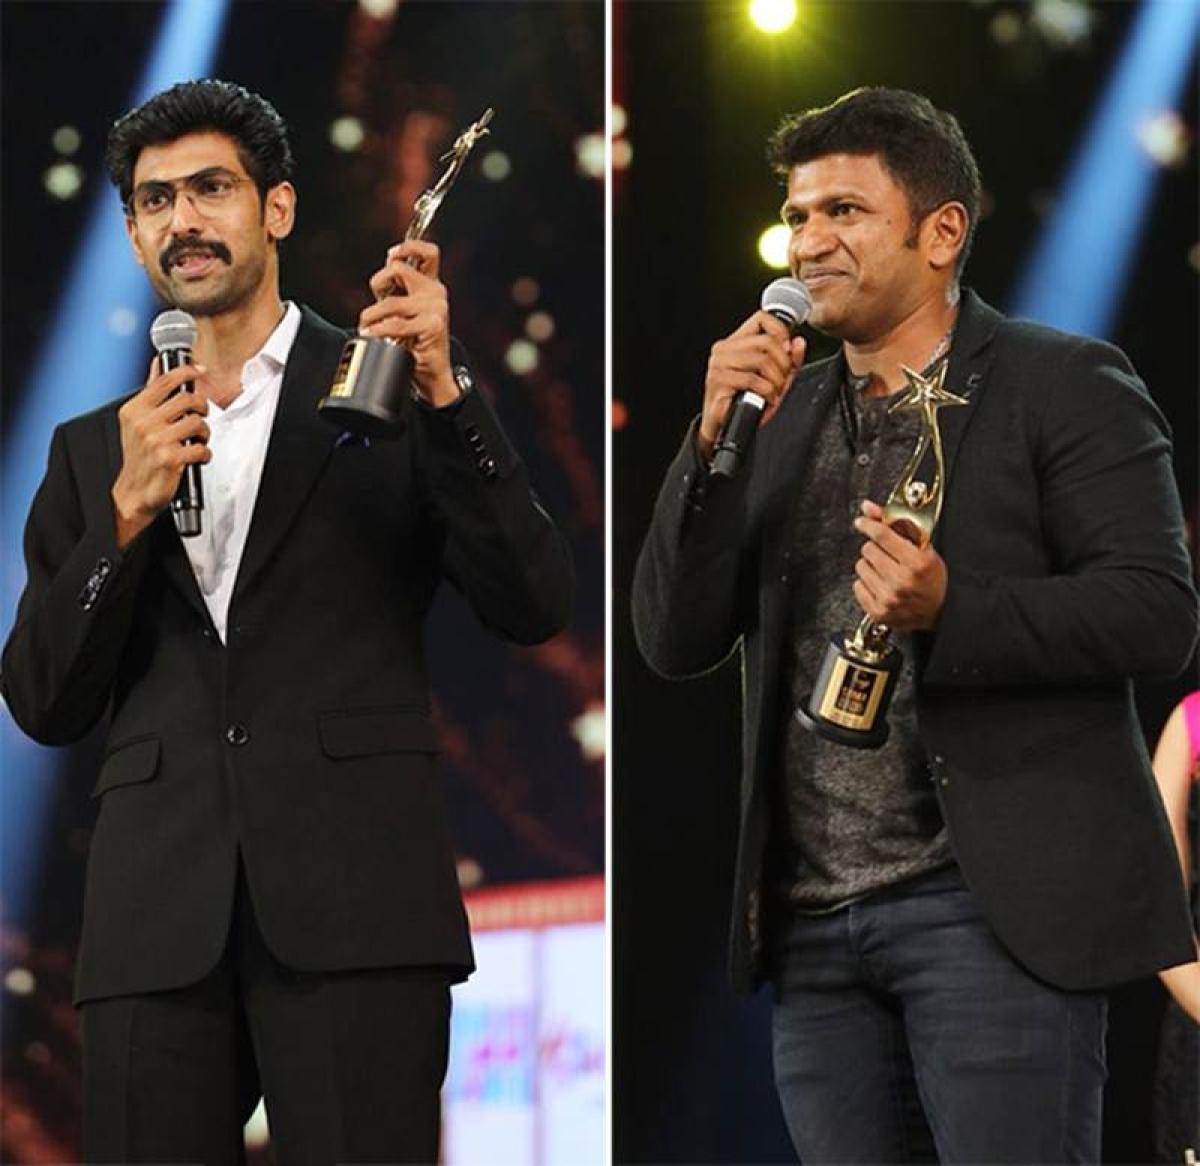 SIIMA 2018: Baahubali multi-lingual film soars high in the Telugu category